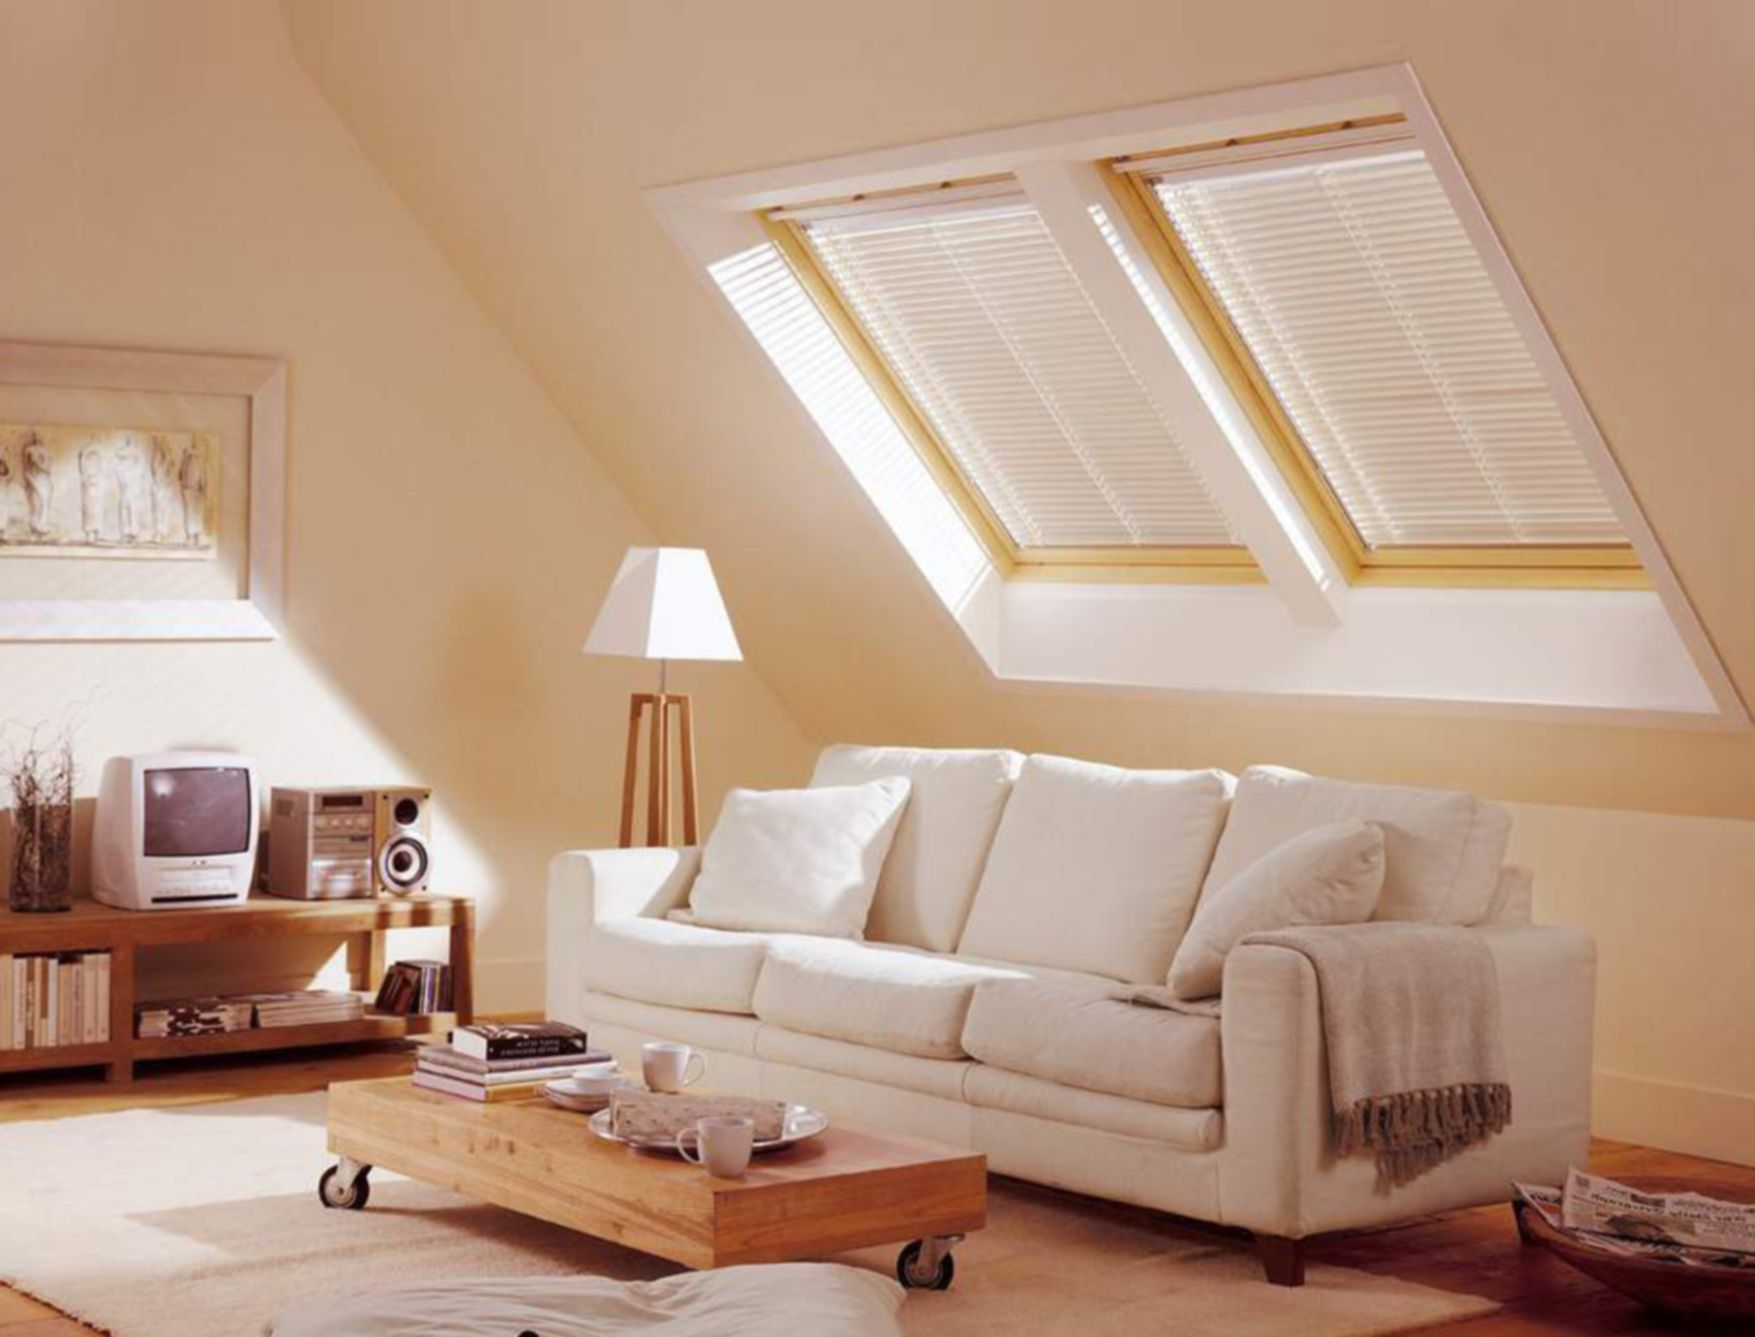 Small attic loft bedroom ideas  Cool Attic Spaces and Ideas  Attic Attic spaces and Attic rooms